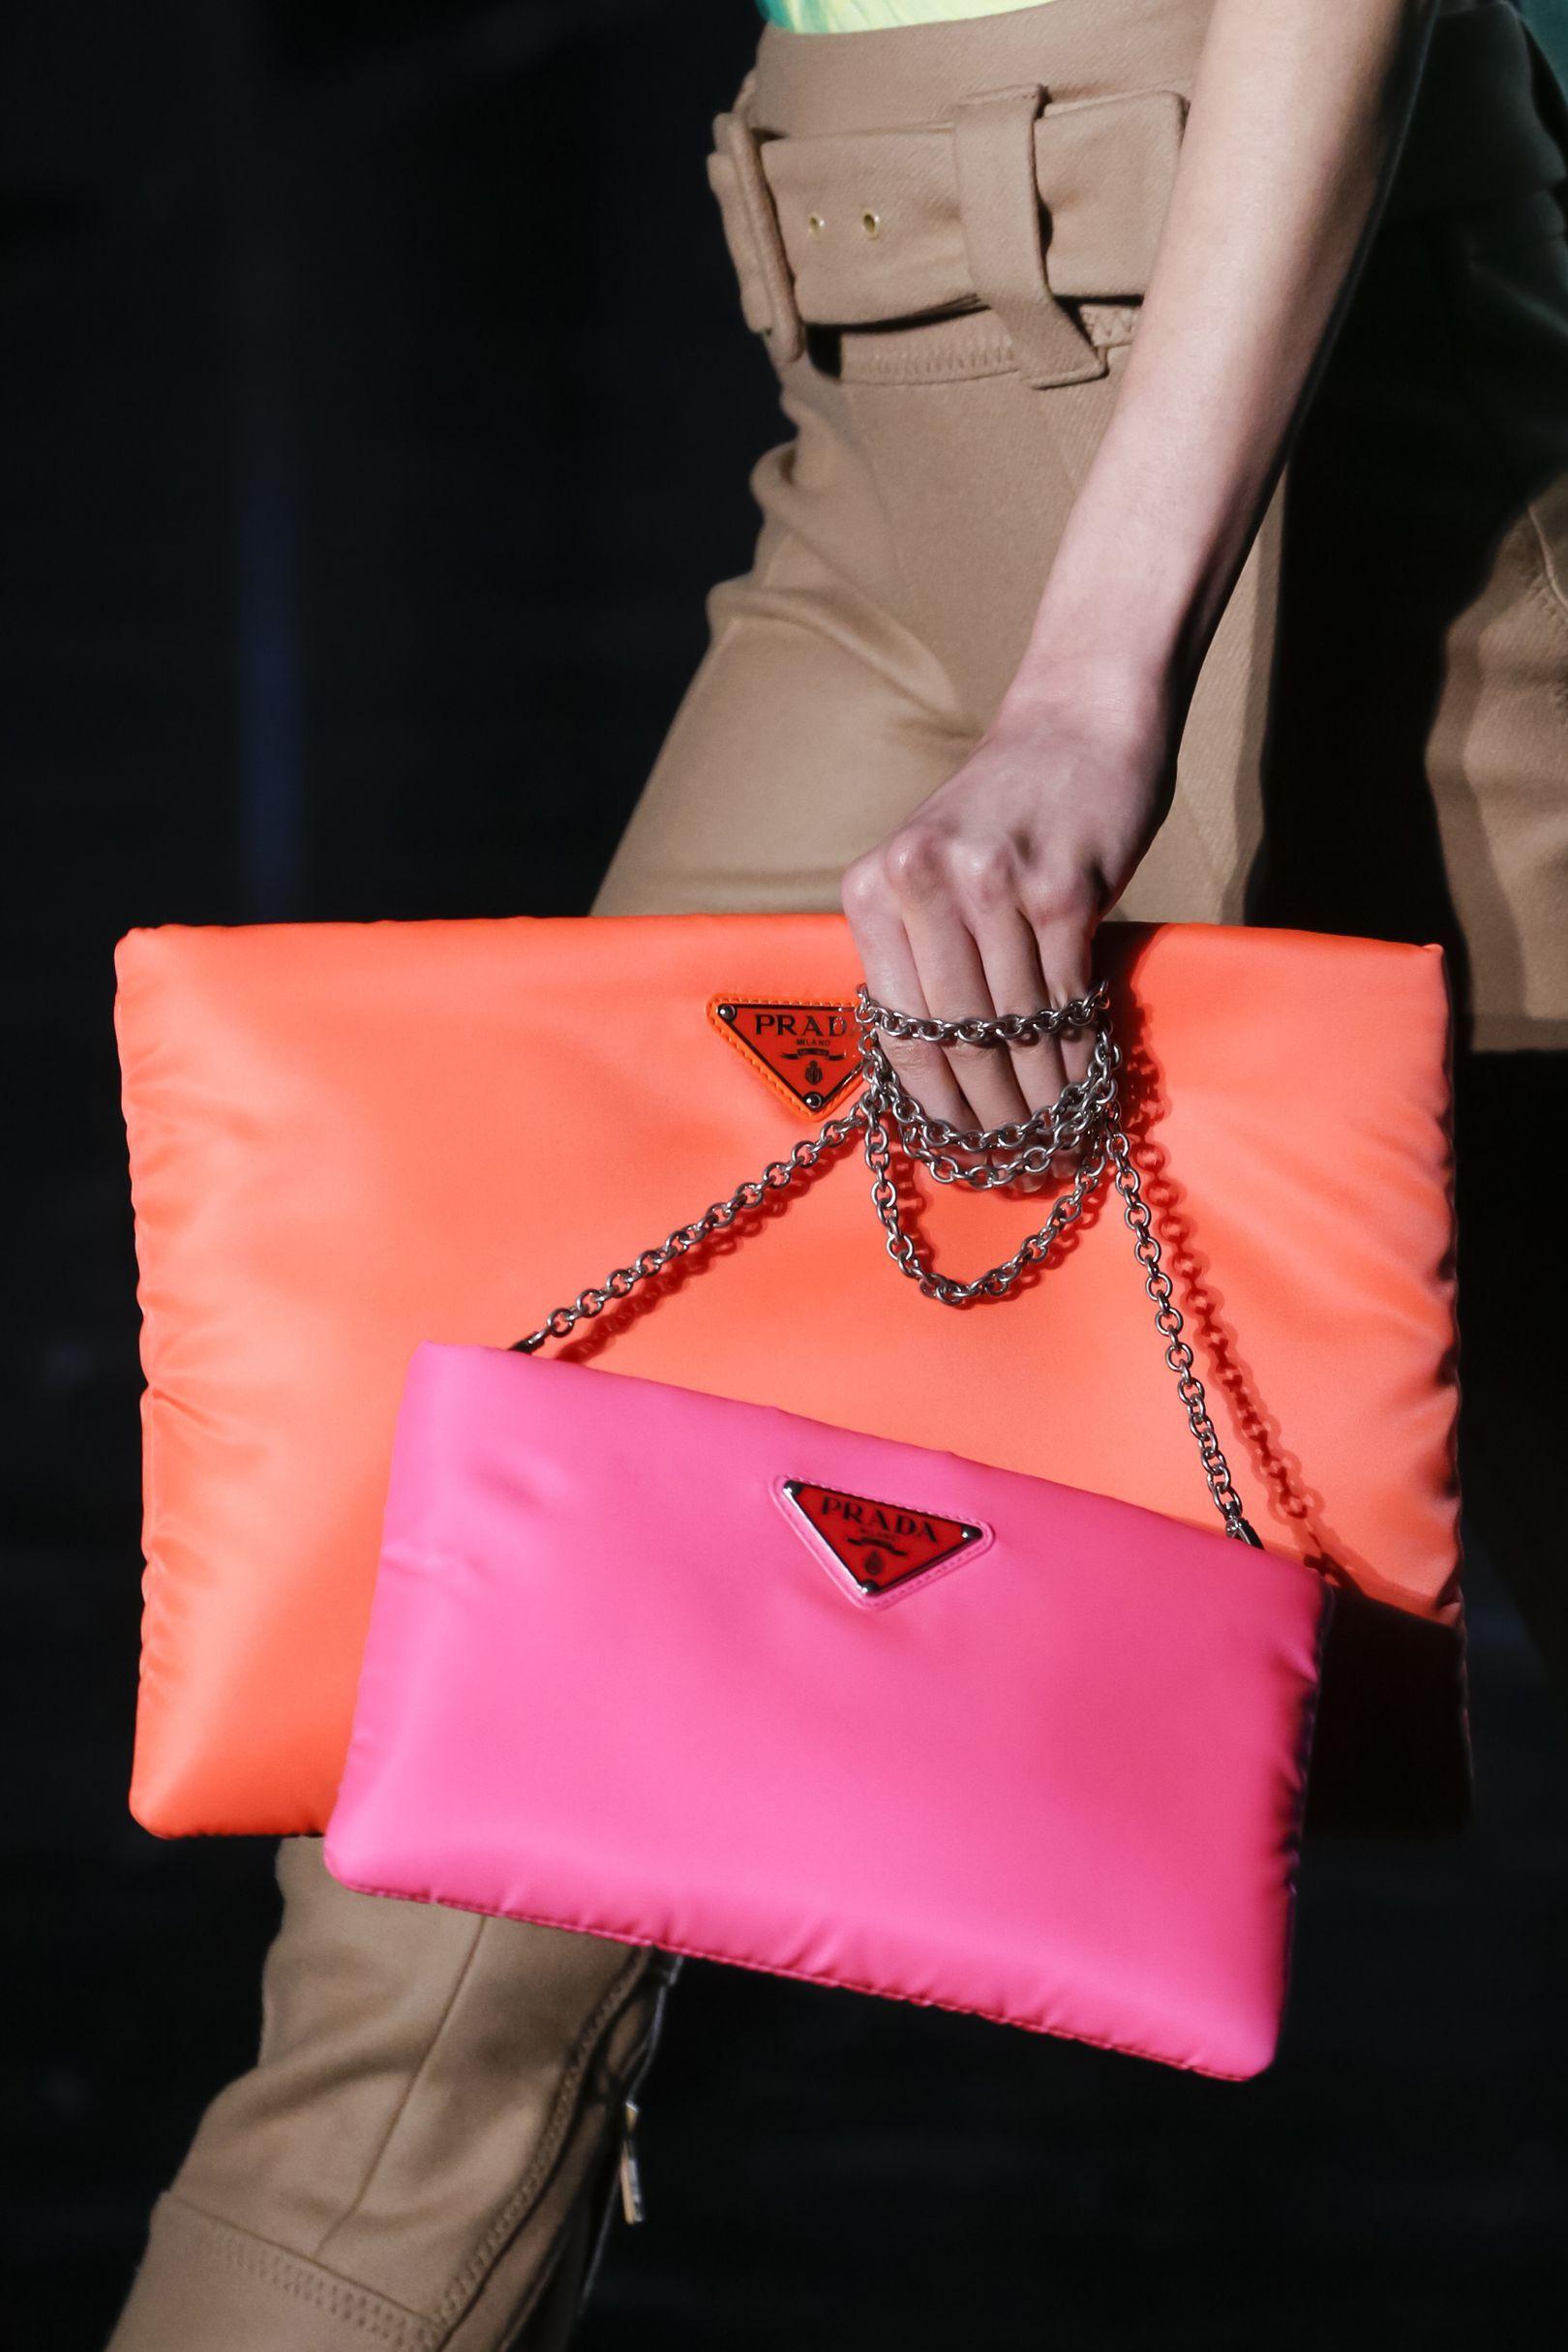 3c8445598d6e Prada's 10 Fashion Commandments | Stylish | Prada bag, Bags, Prada ...